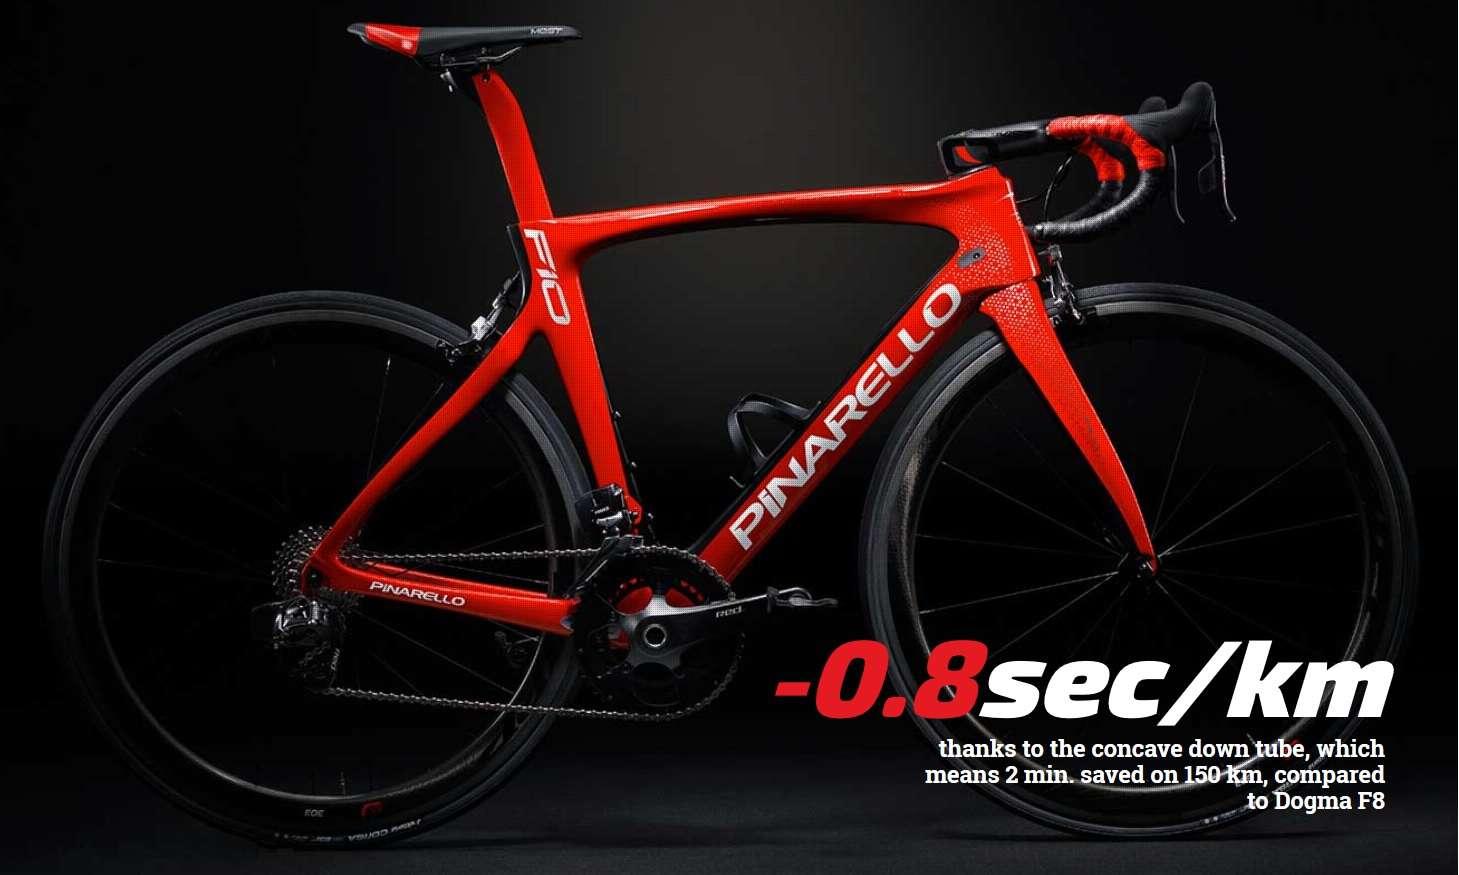 Pinarello Dogma F10: Engineered for speed